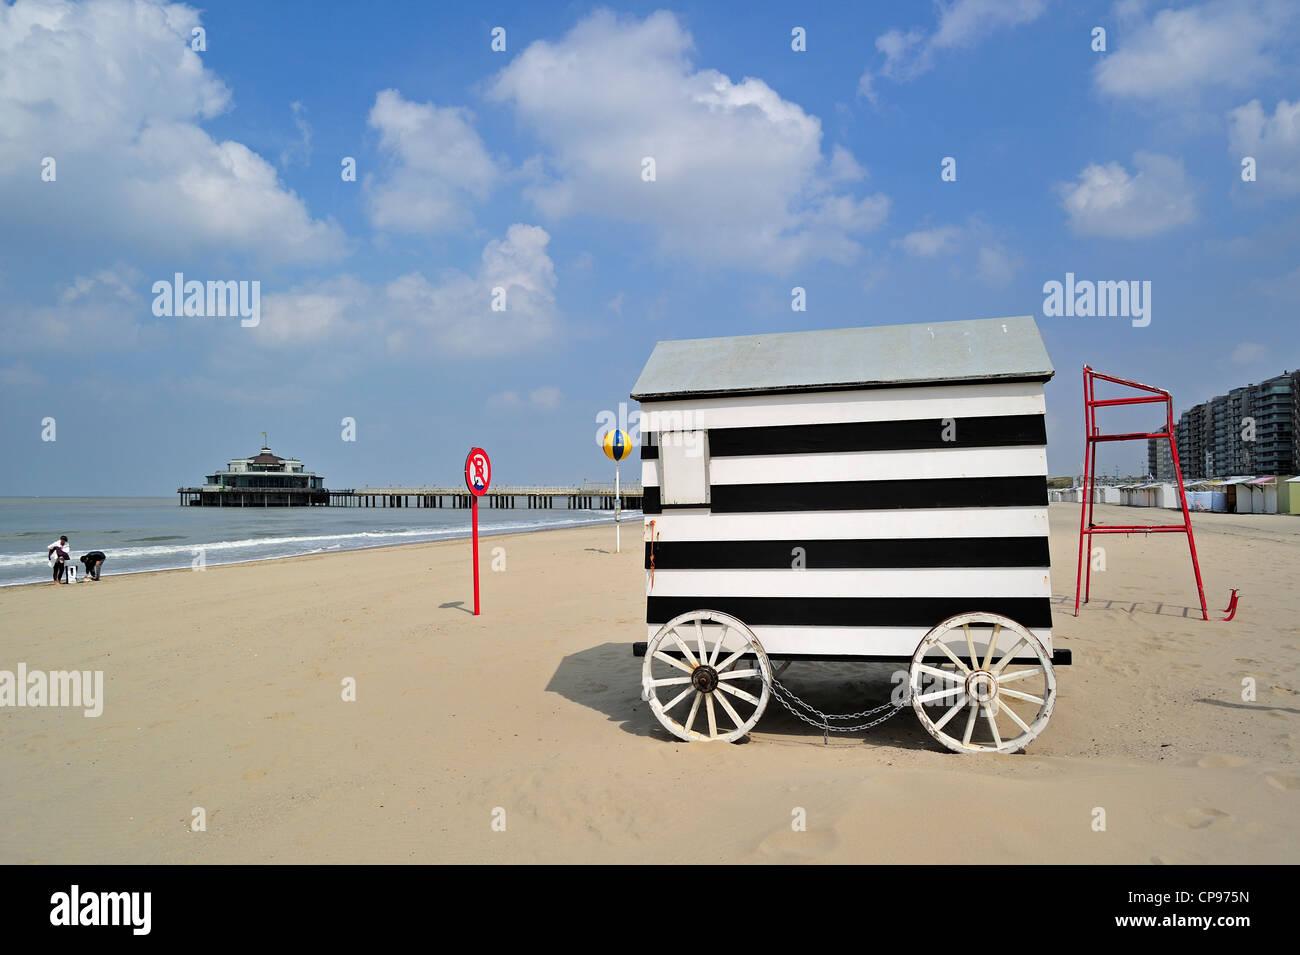 cabin seaside hut stockfotos cabin seaside hut bilder alamy. Black Bedroom Furniture Sets. Home Design Ideas